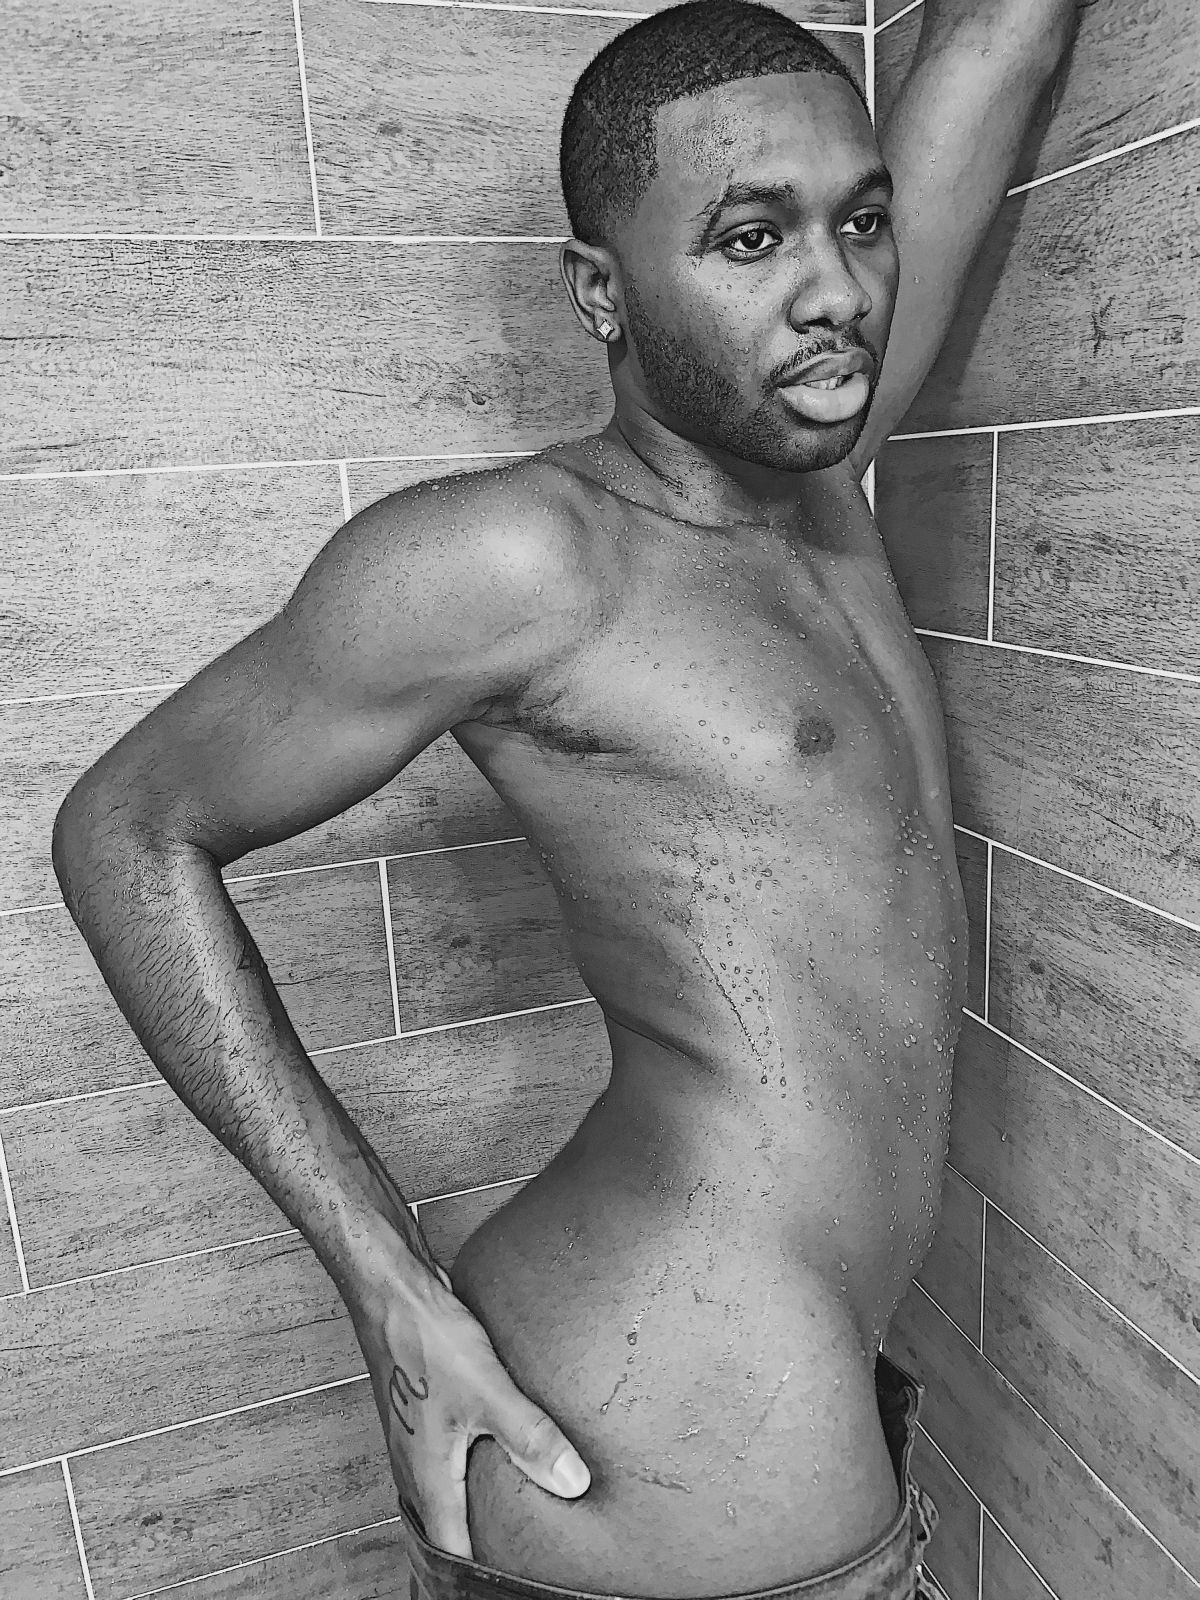 Lamont Odum onlyfans leaked onlyfans leaked